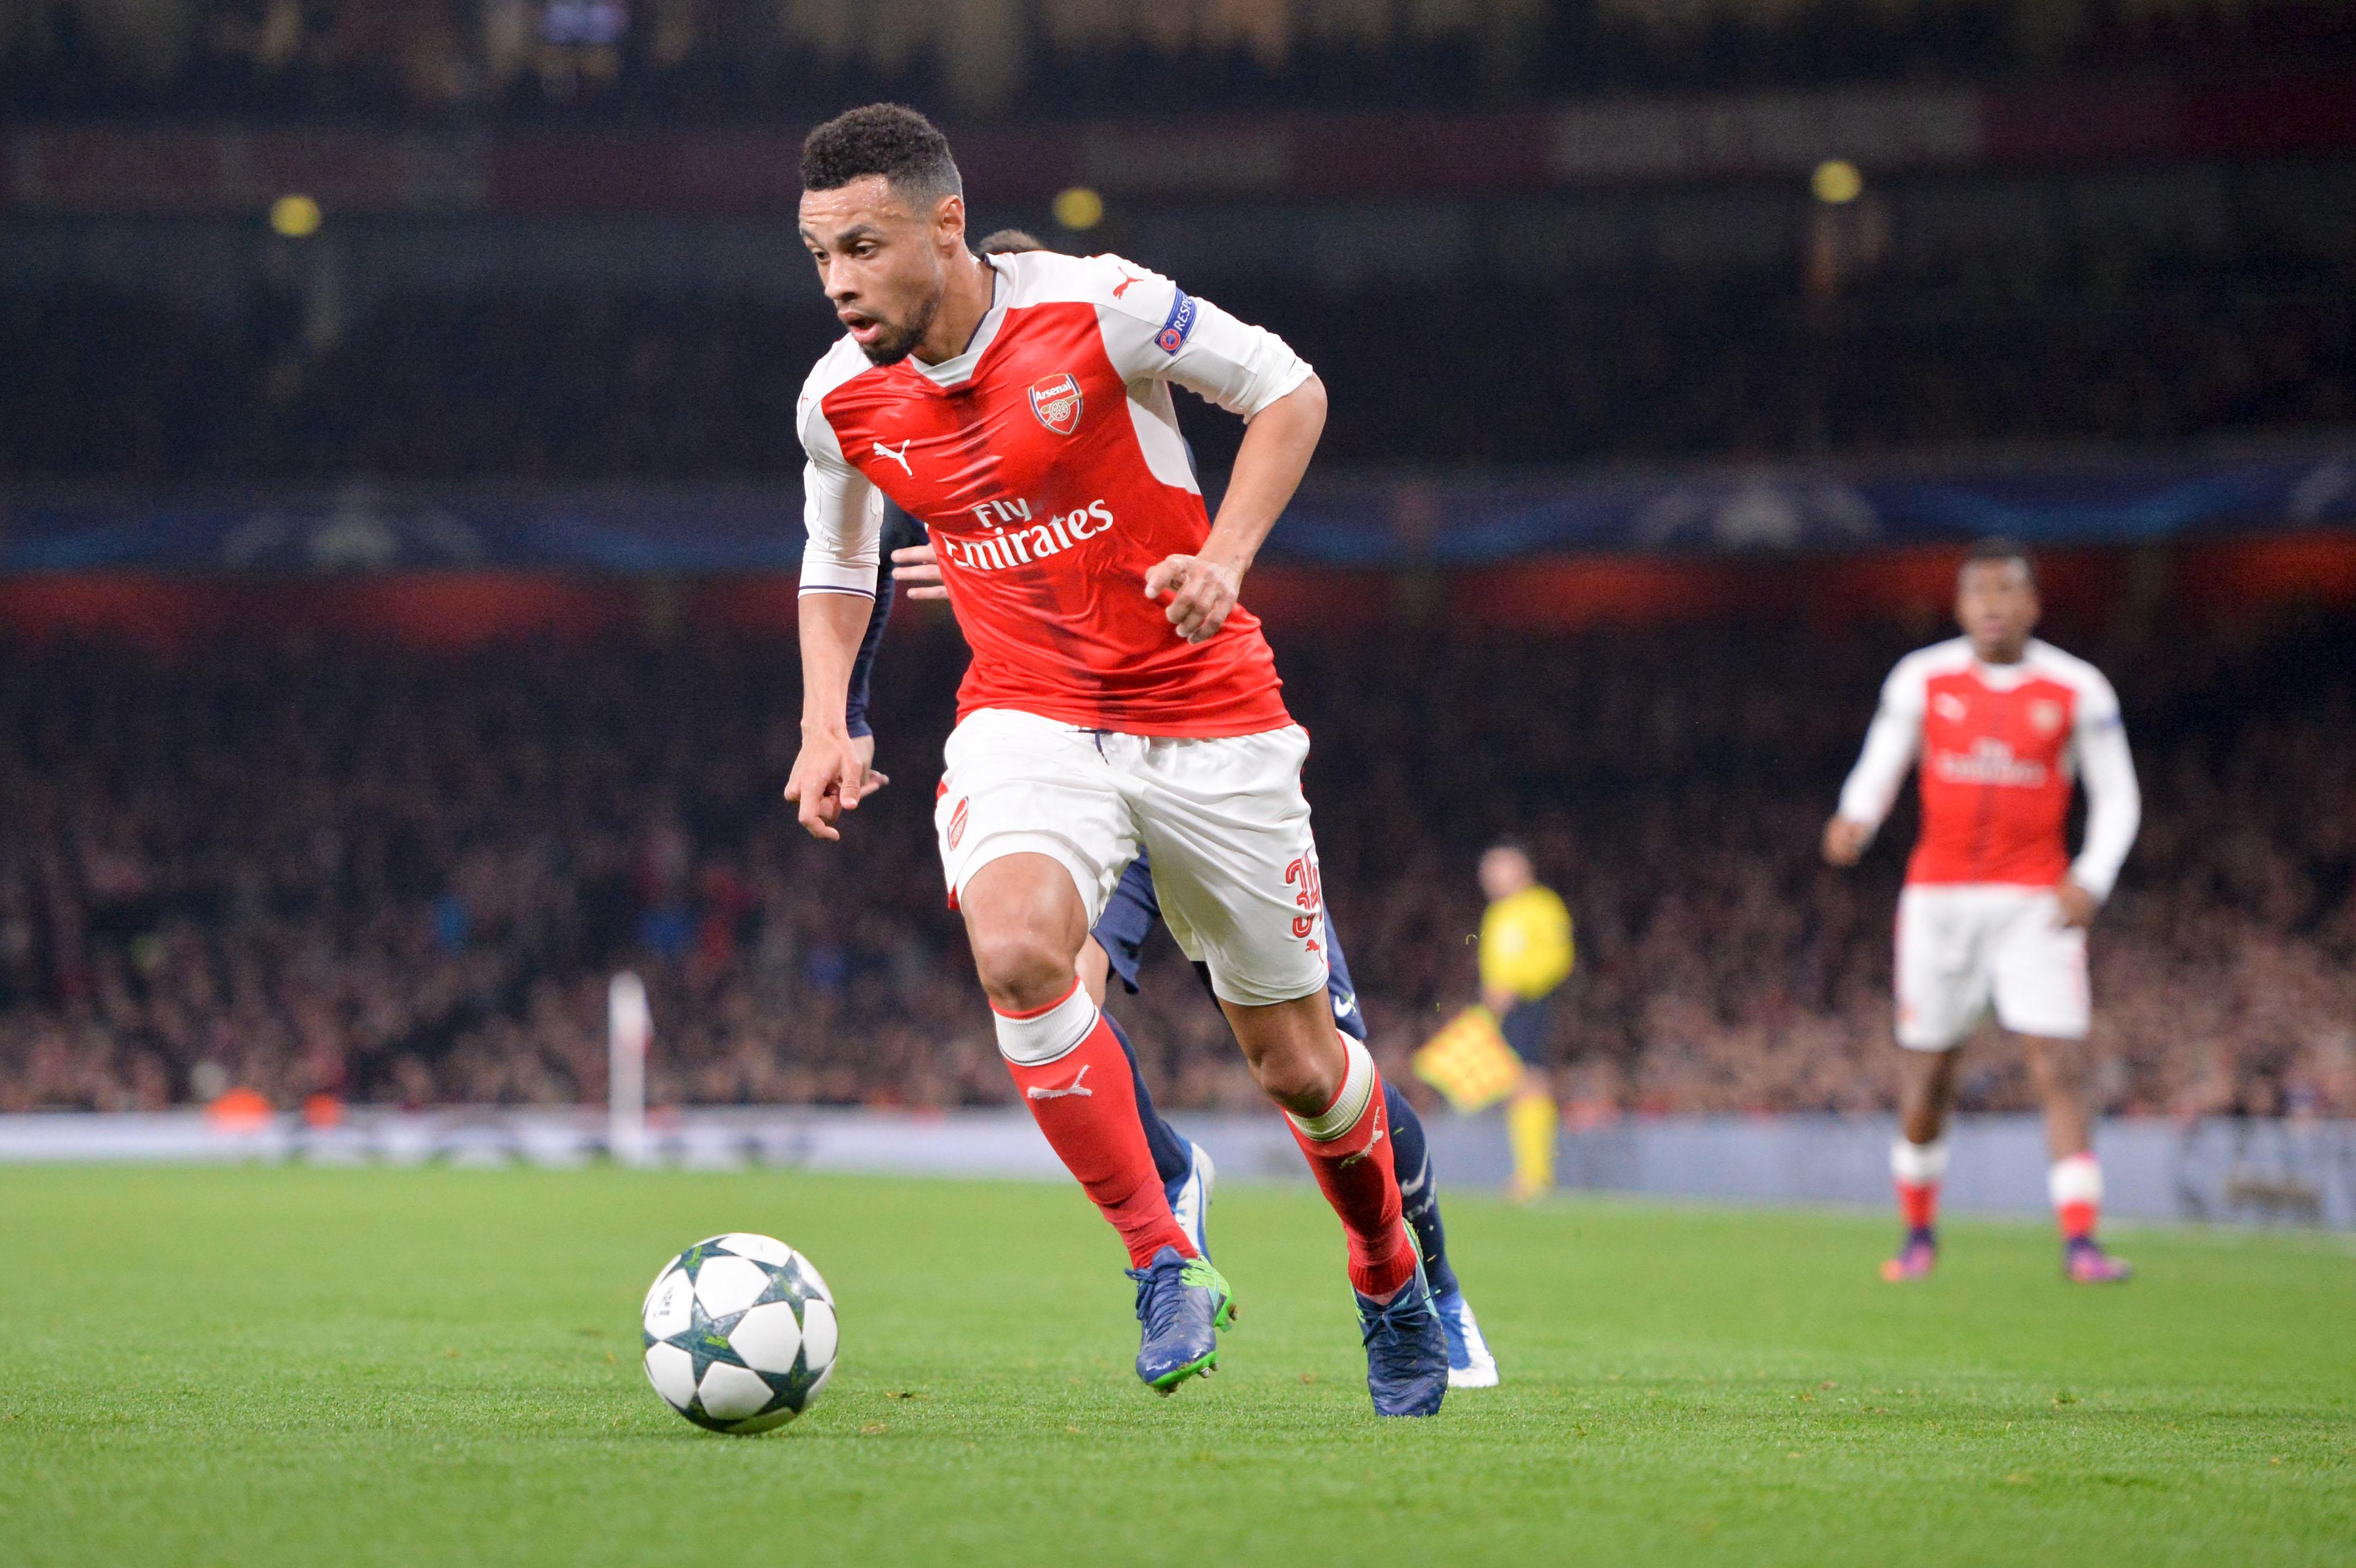 Football - Etranger - Arsenal-Southampton en DIRECT